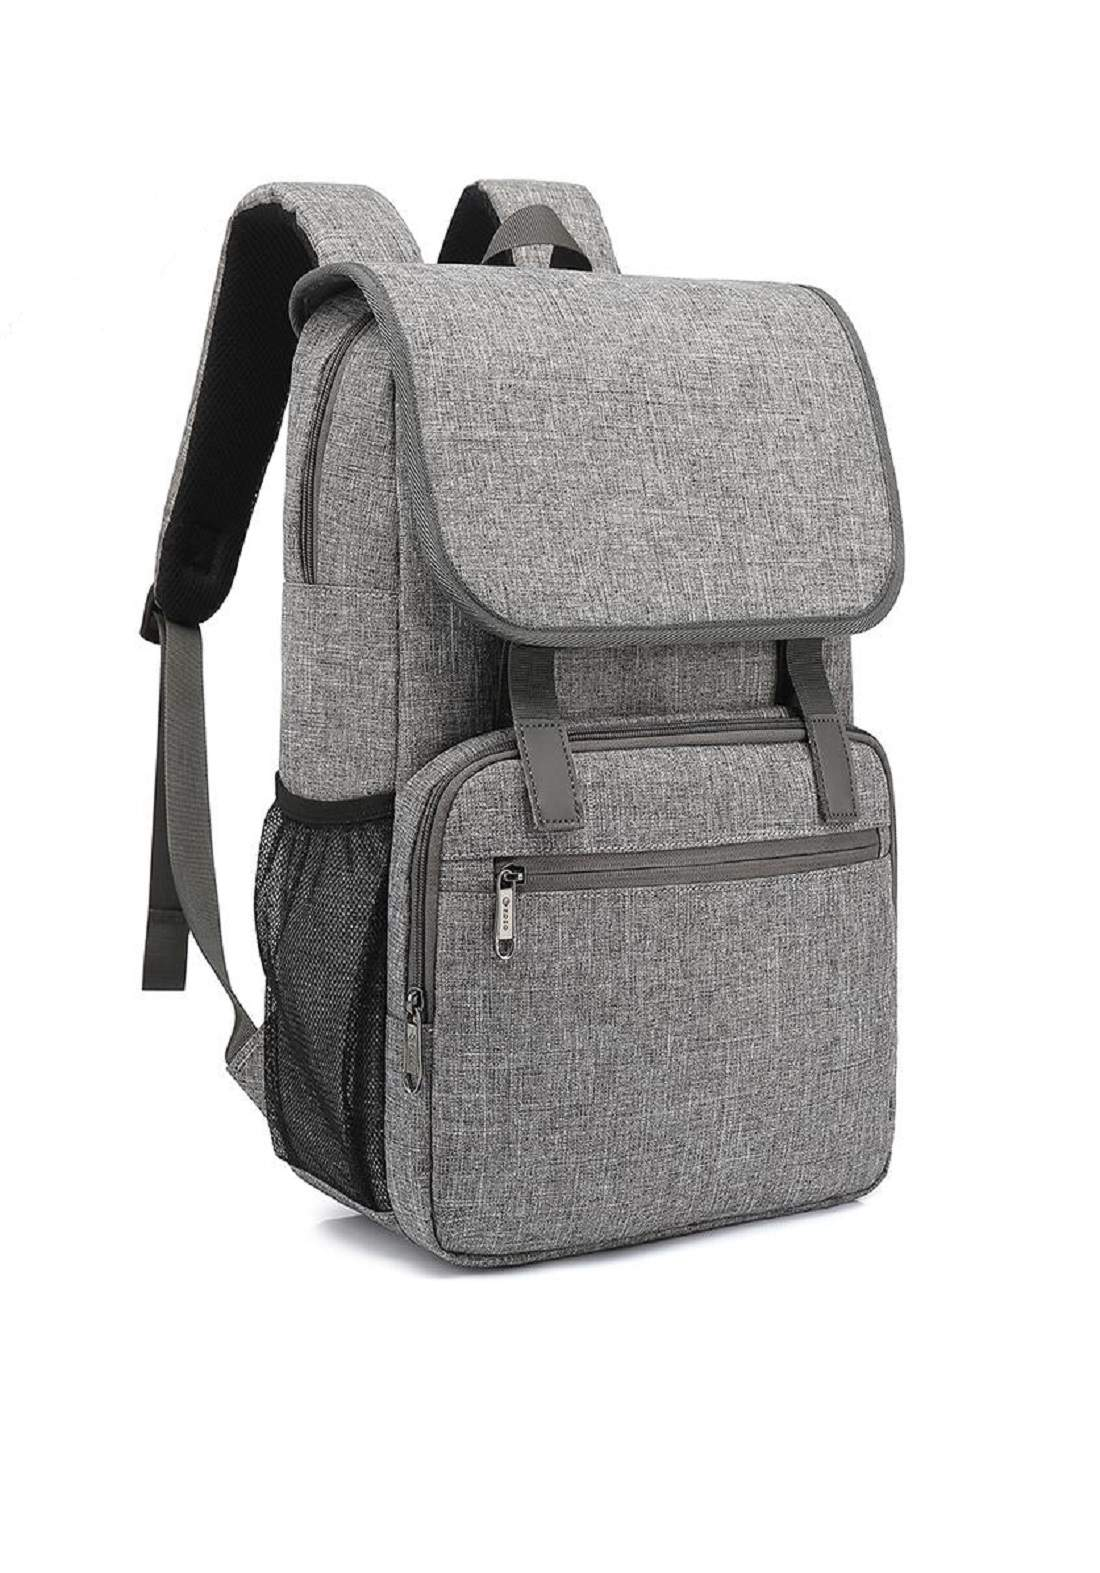 Poso PS-658 Laptop Bag-Grey حقيبة لابتوب